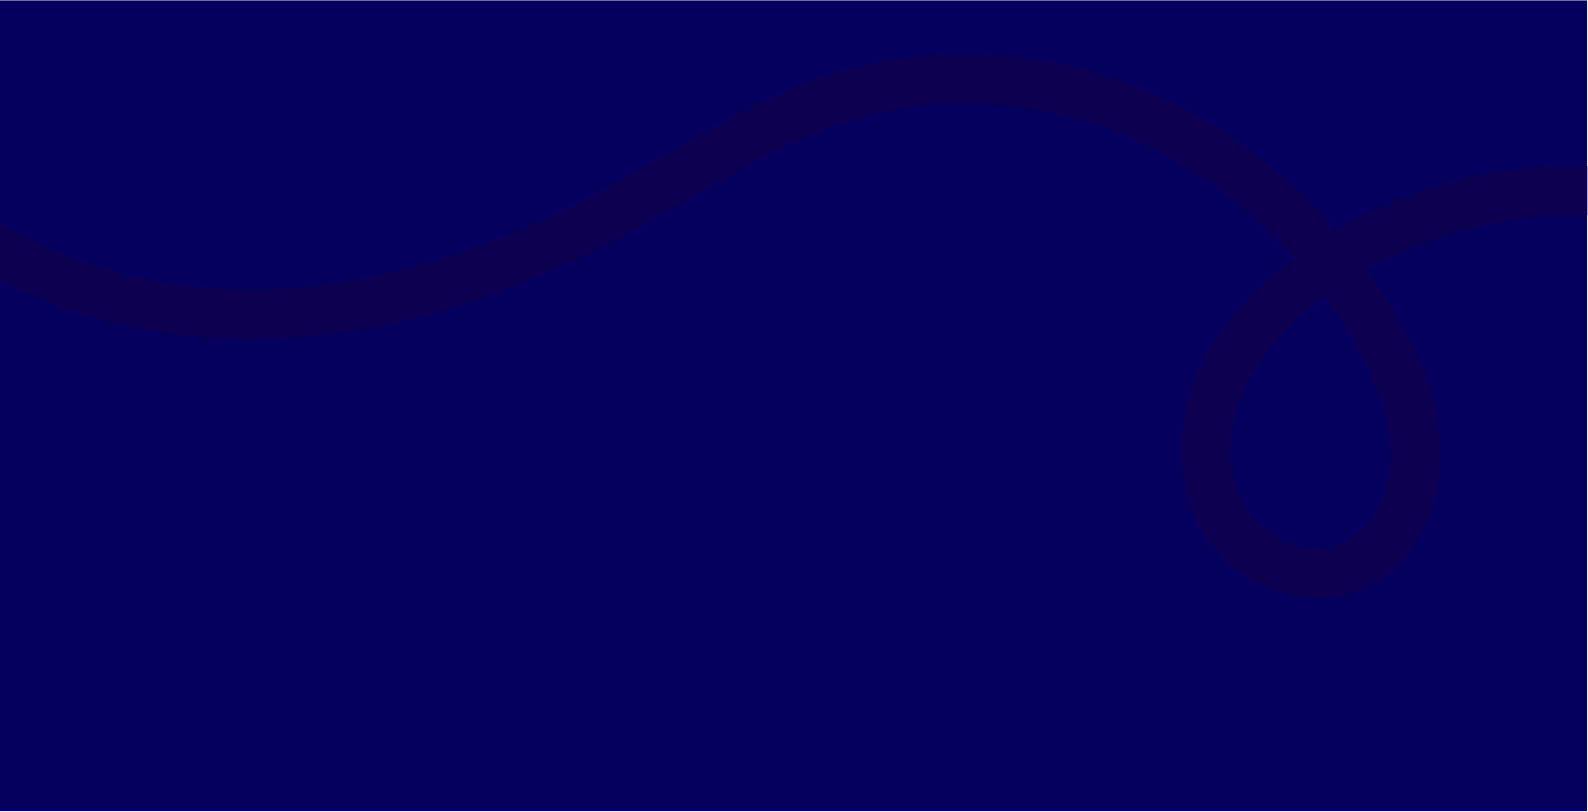 blue banner-20.png